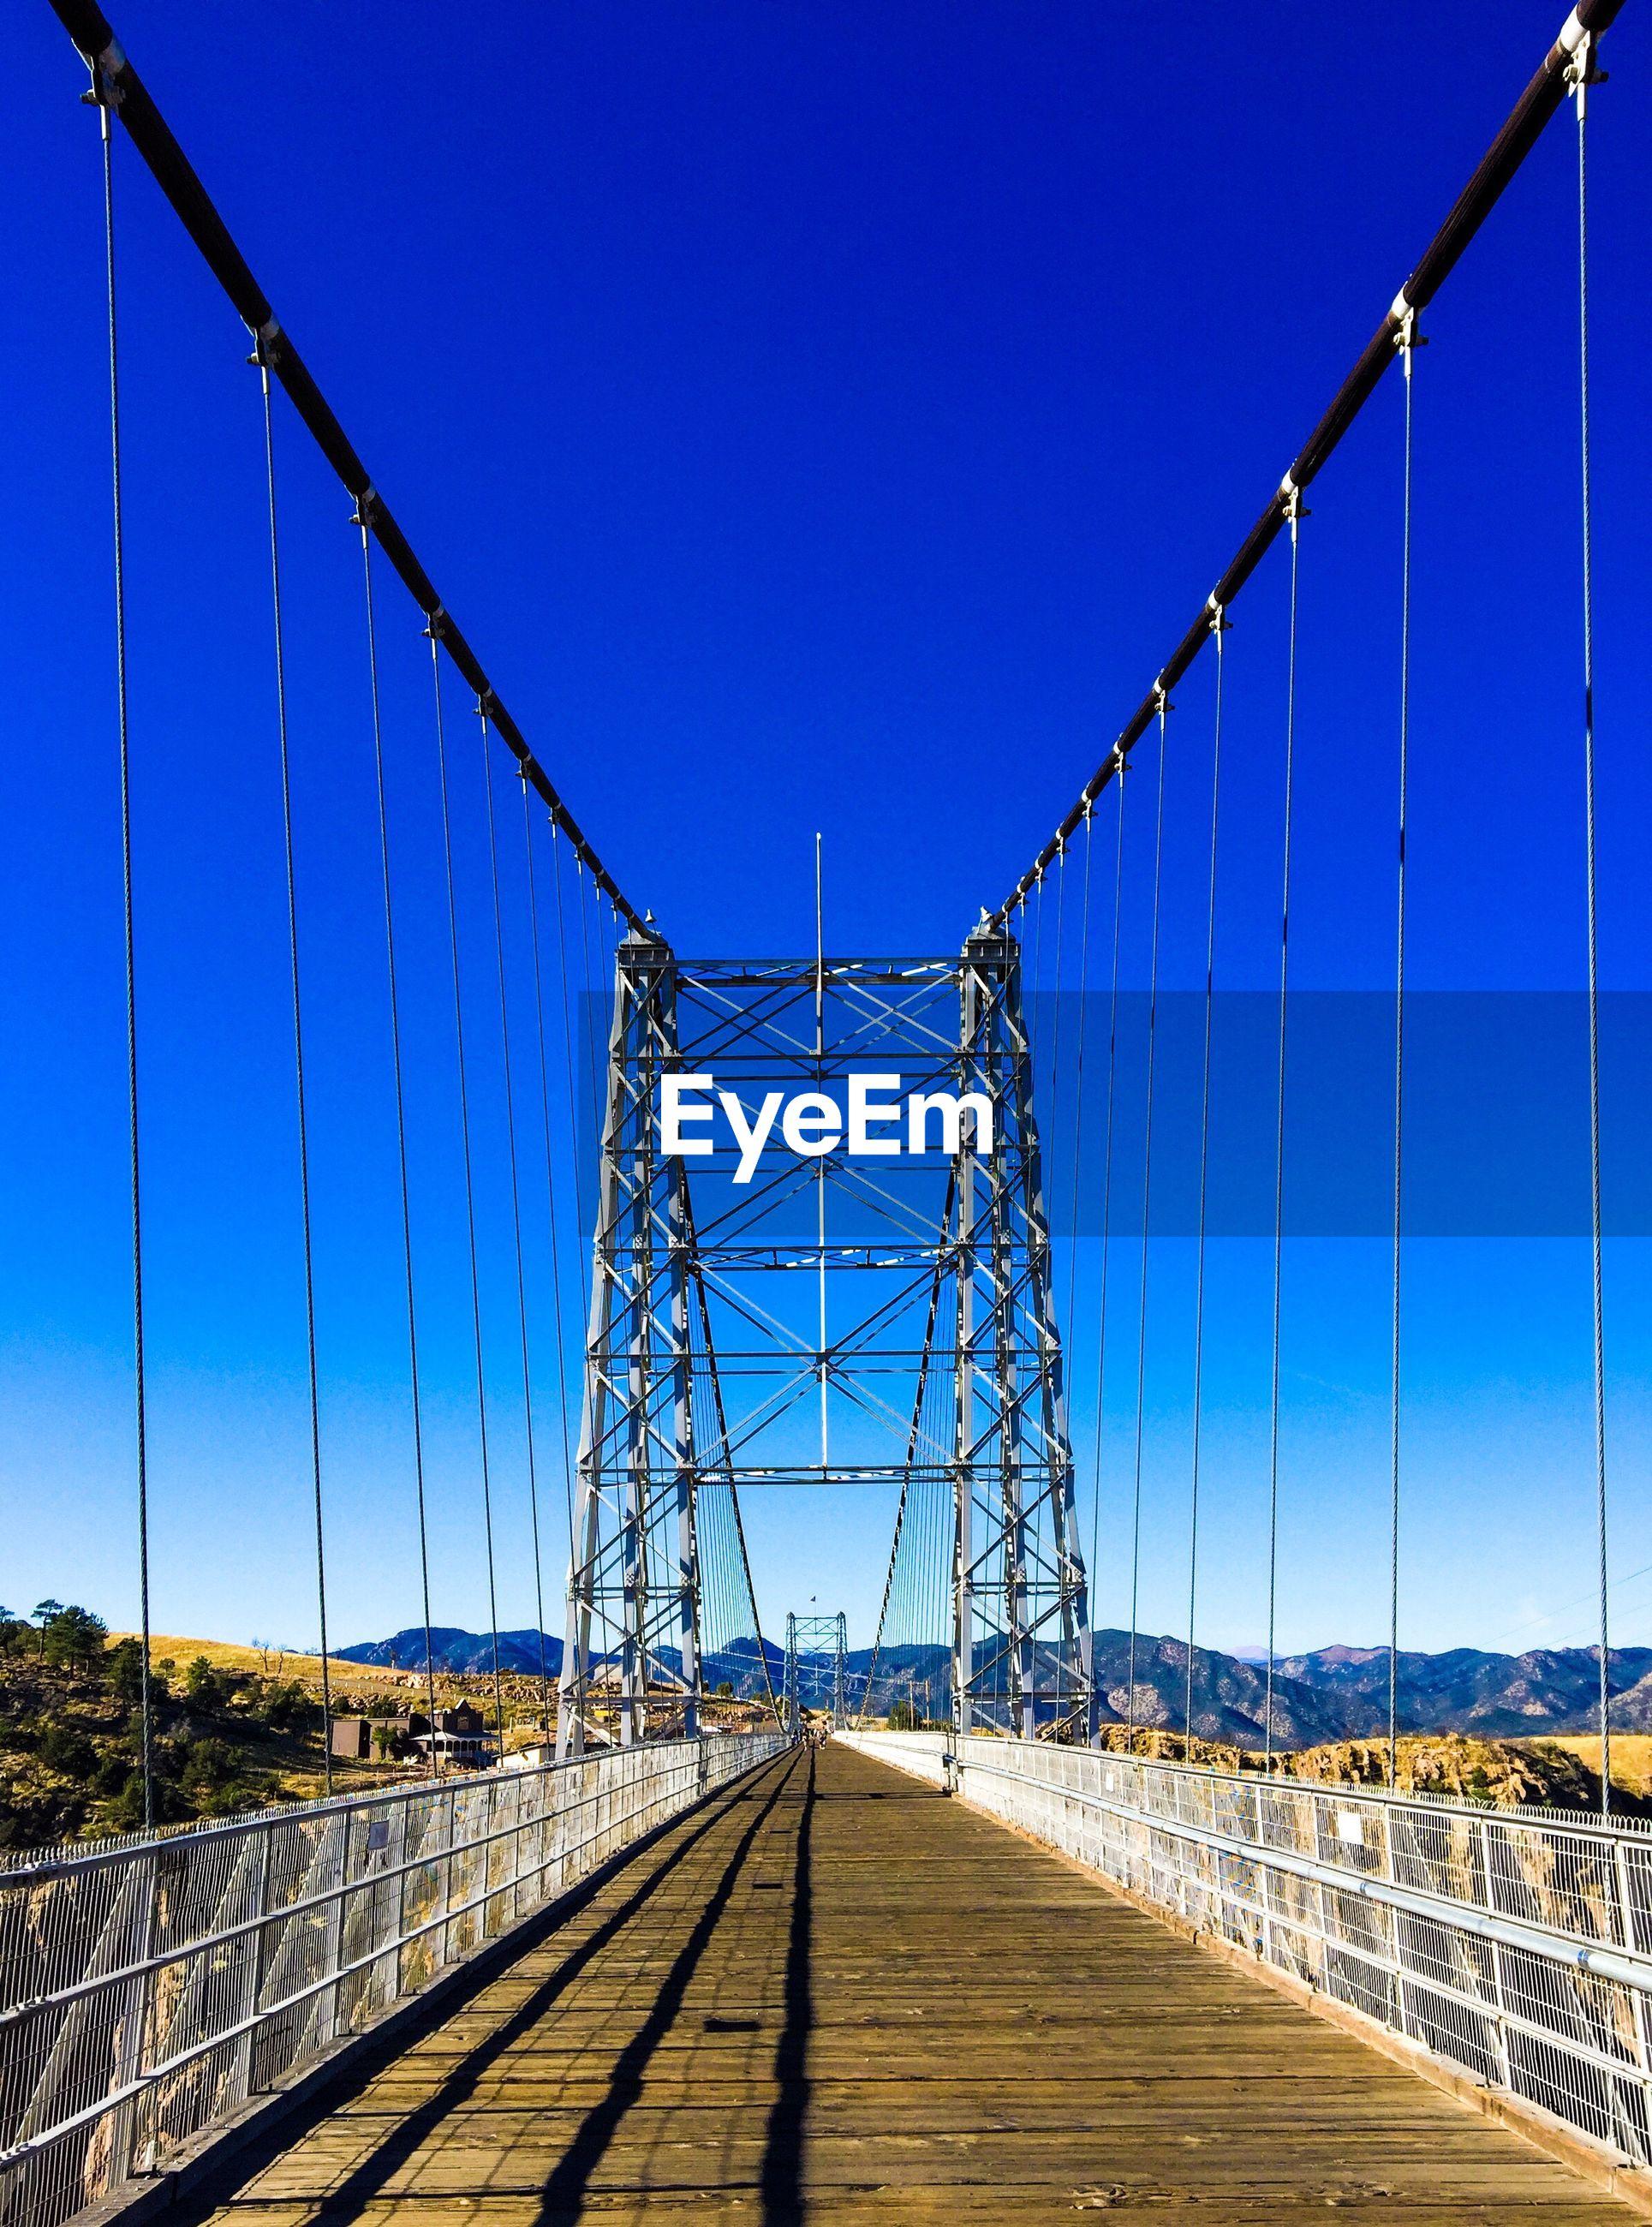 Empty royal gorge bridge against clear blue sky